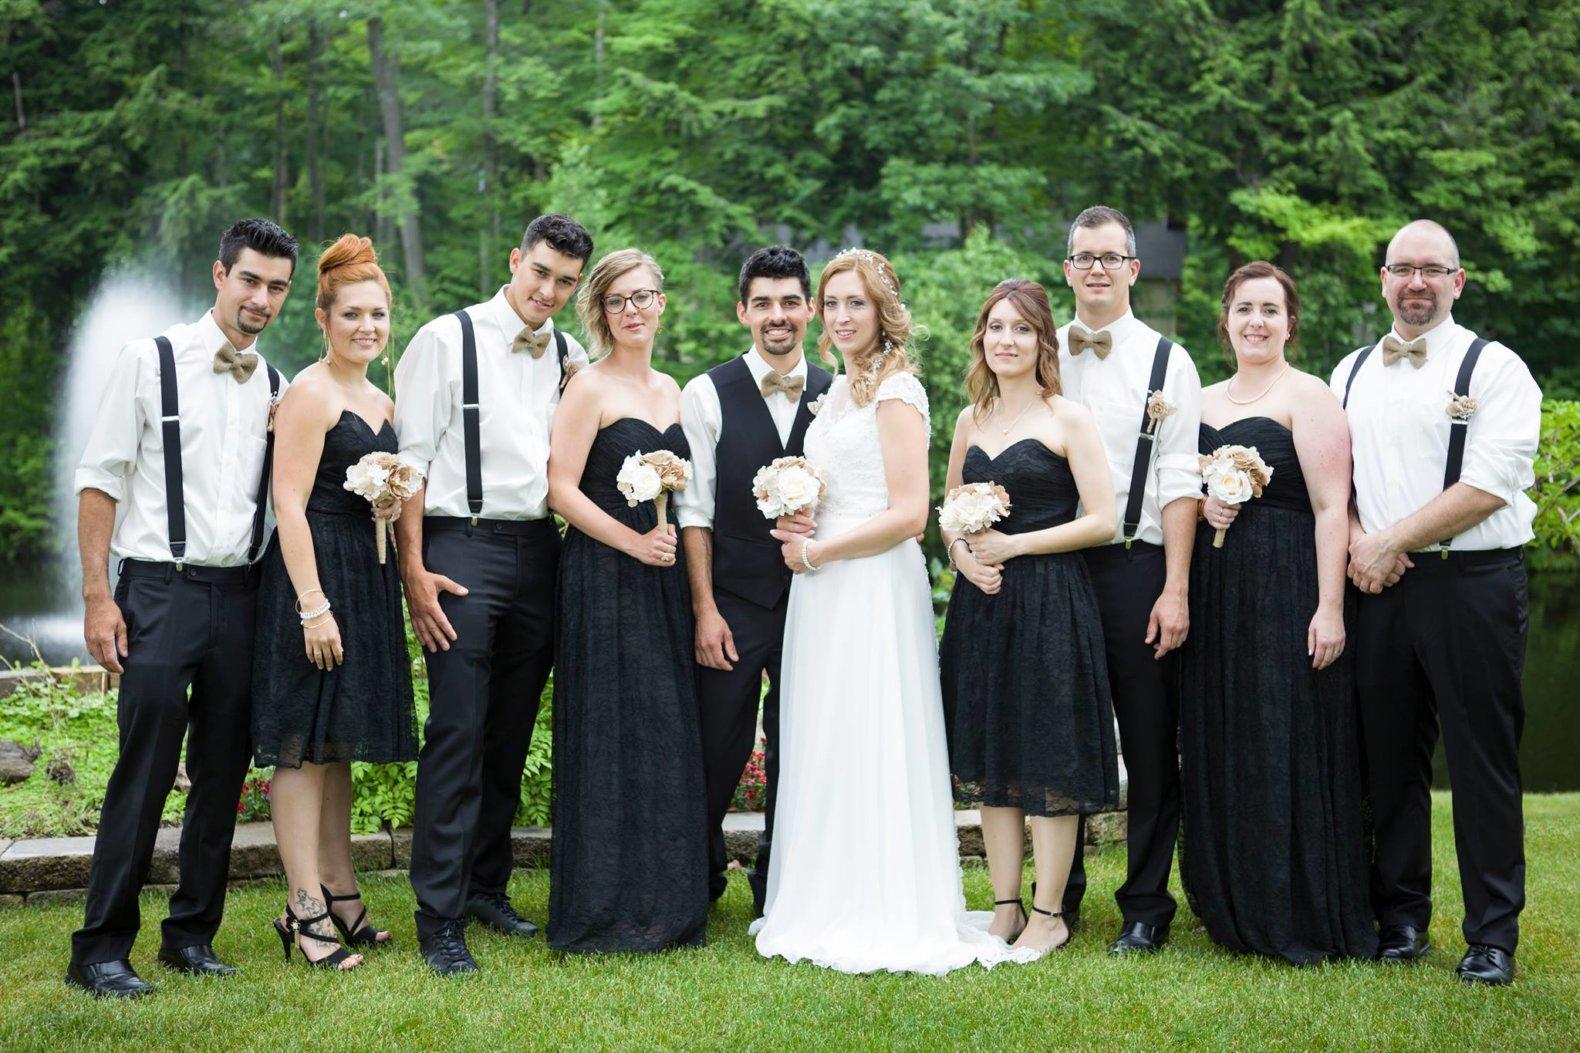 mariés et demoiselles & garçons d'honneur